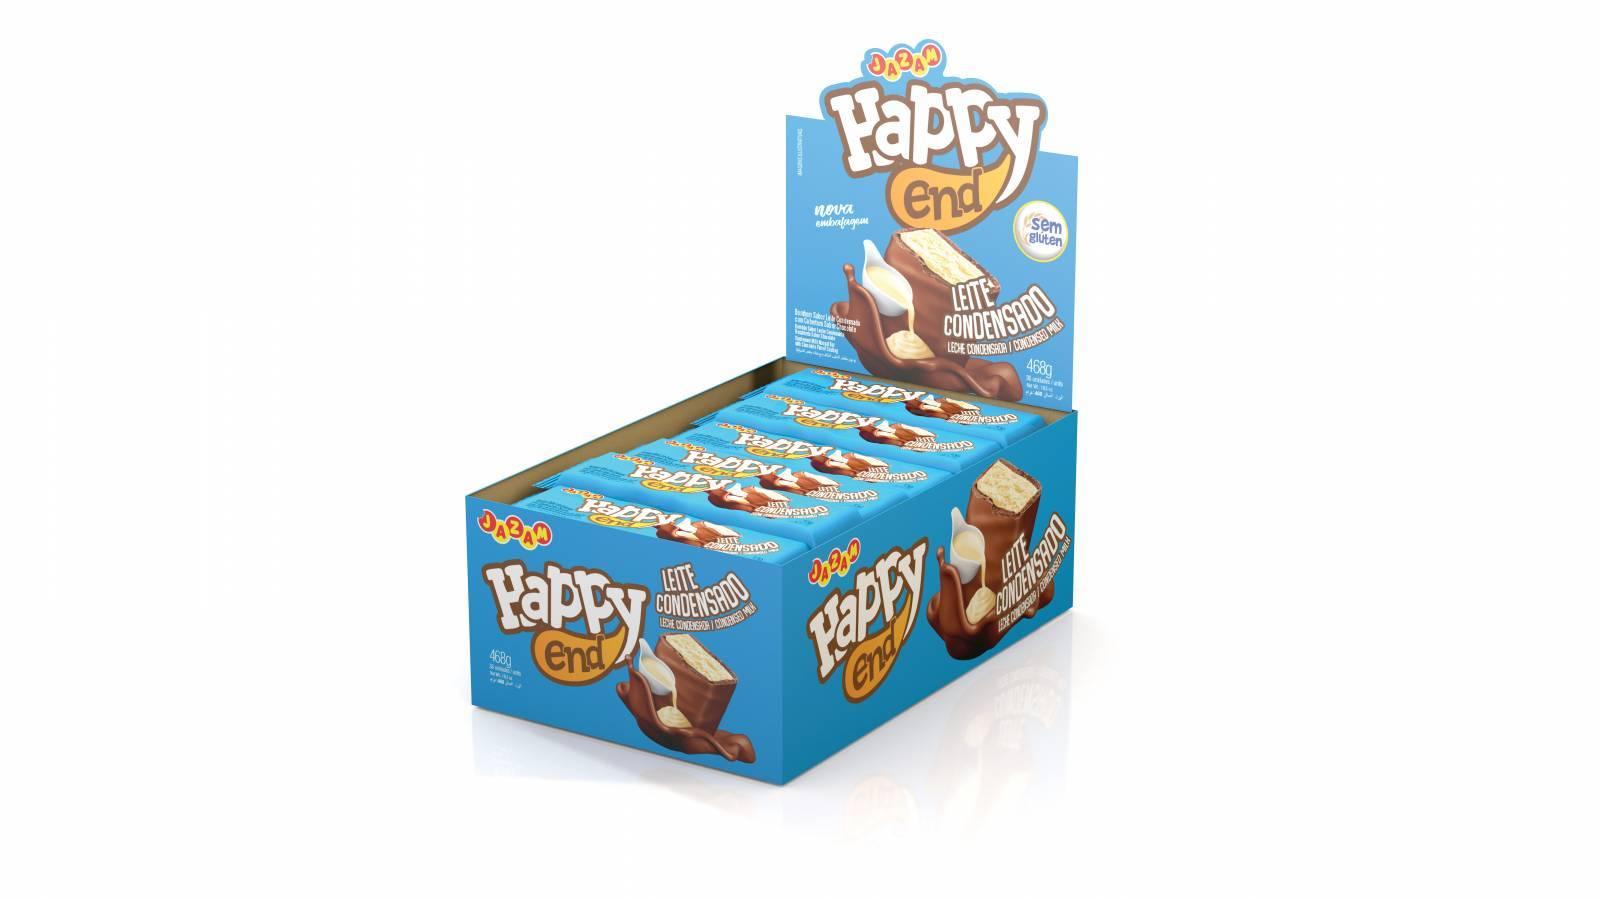 Bombom Happy End Leite Condensado - 468g - Jazam Alimentos